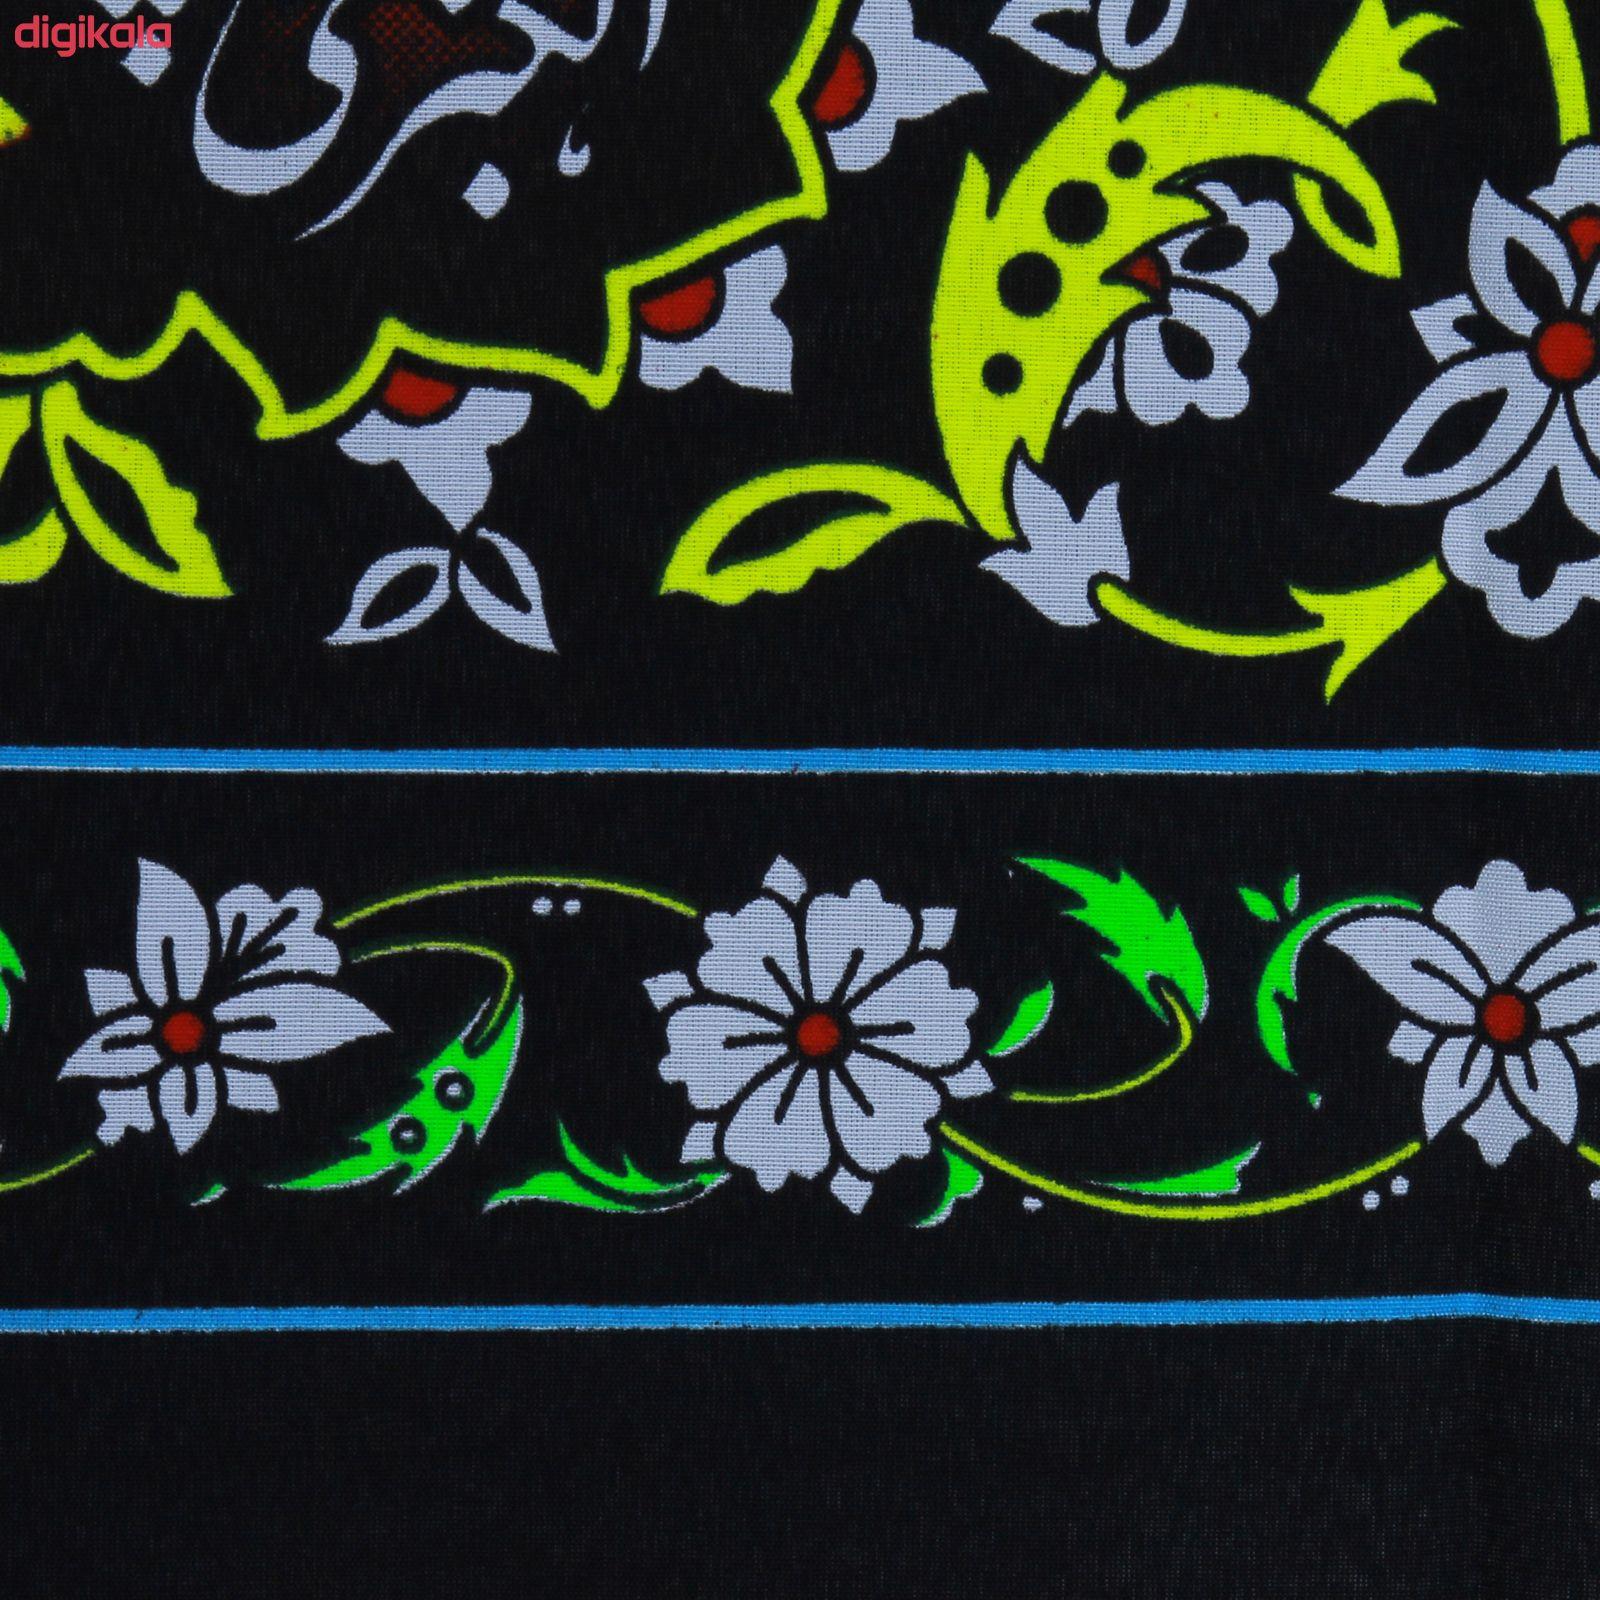 پرچم طرح یااباالفضل العباس ادرکنی کد PAR-070